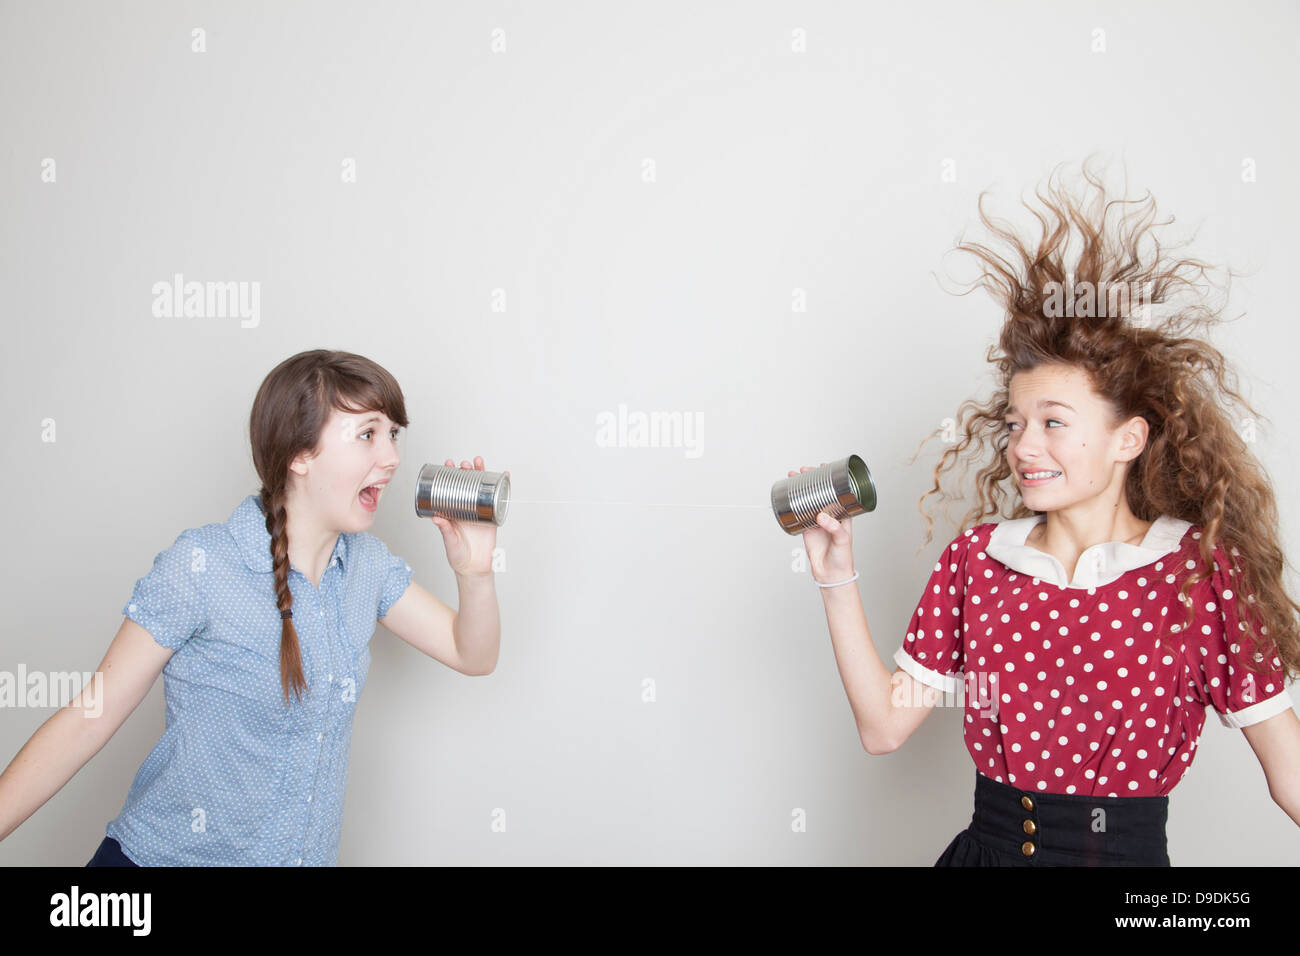 Girls using tin can telephones - Stock Image